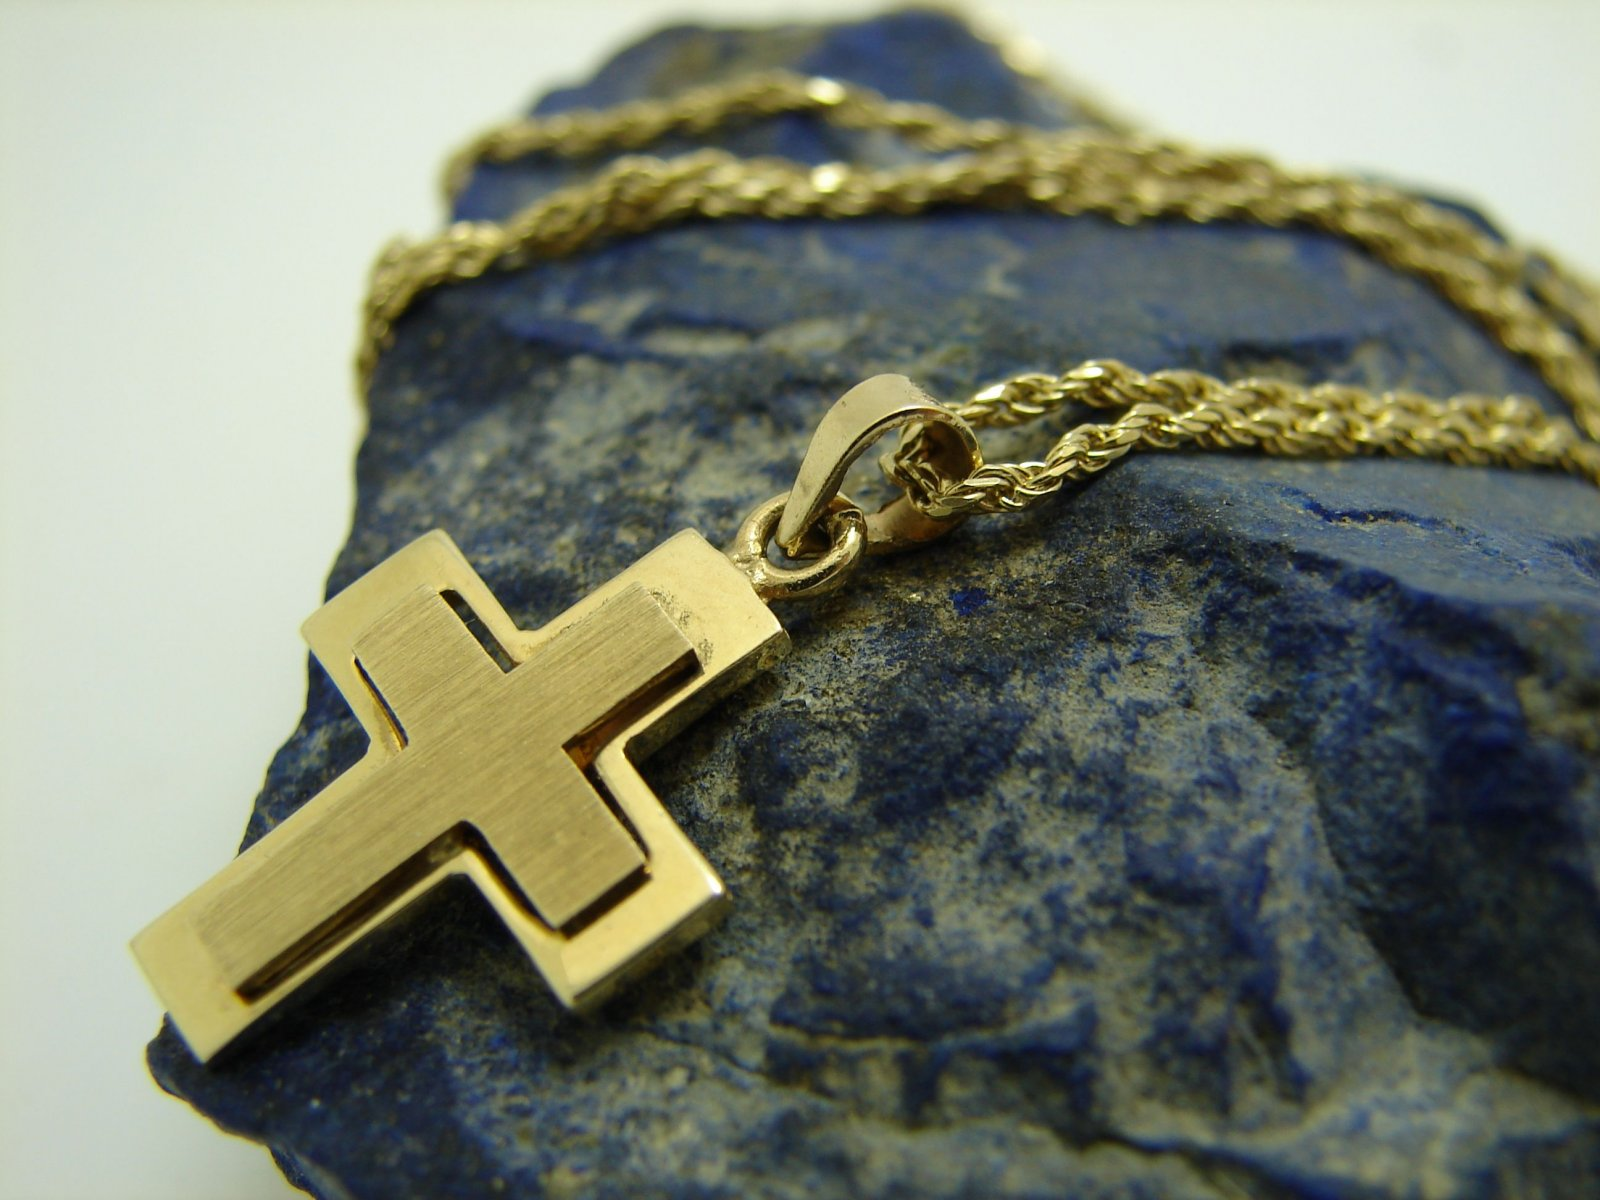 Goldkette mit kreuz 585  Damen Goldkette mit Kreuz 585 Gold 14 Karat Länge 45 cm Goldkreuz ...